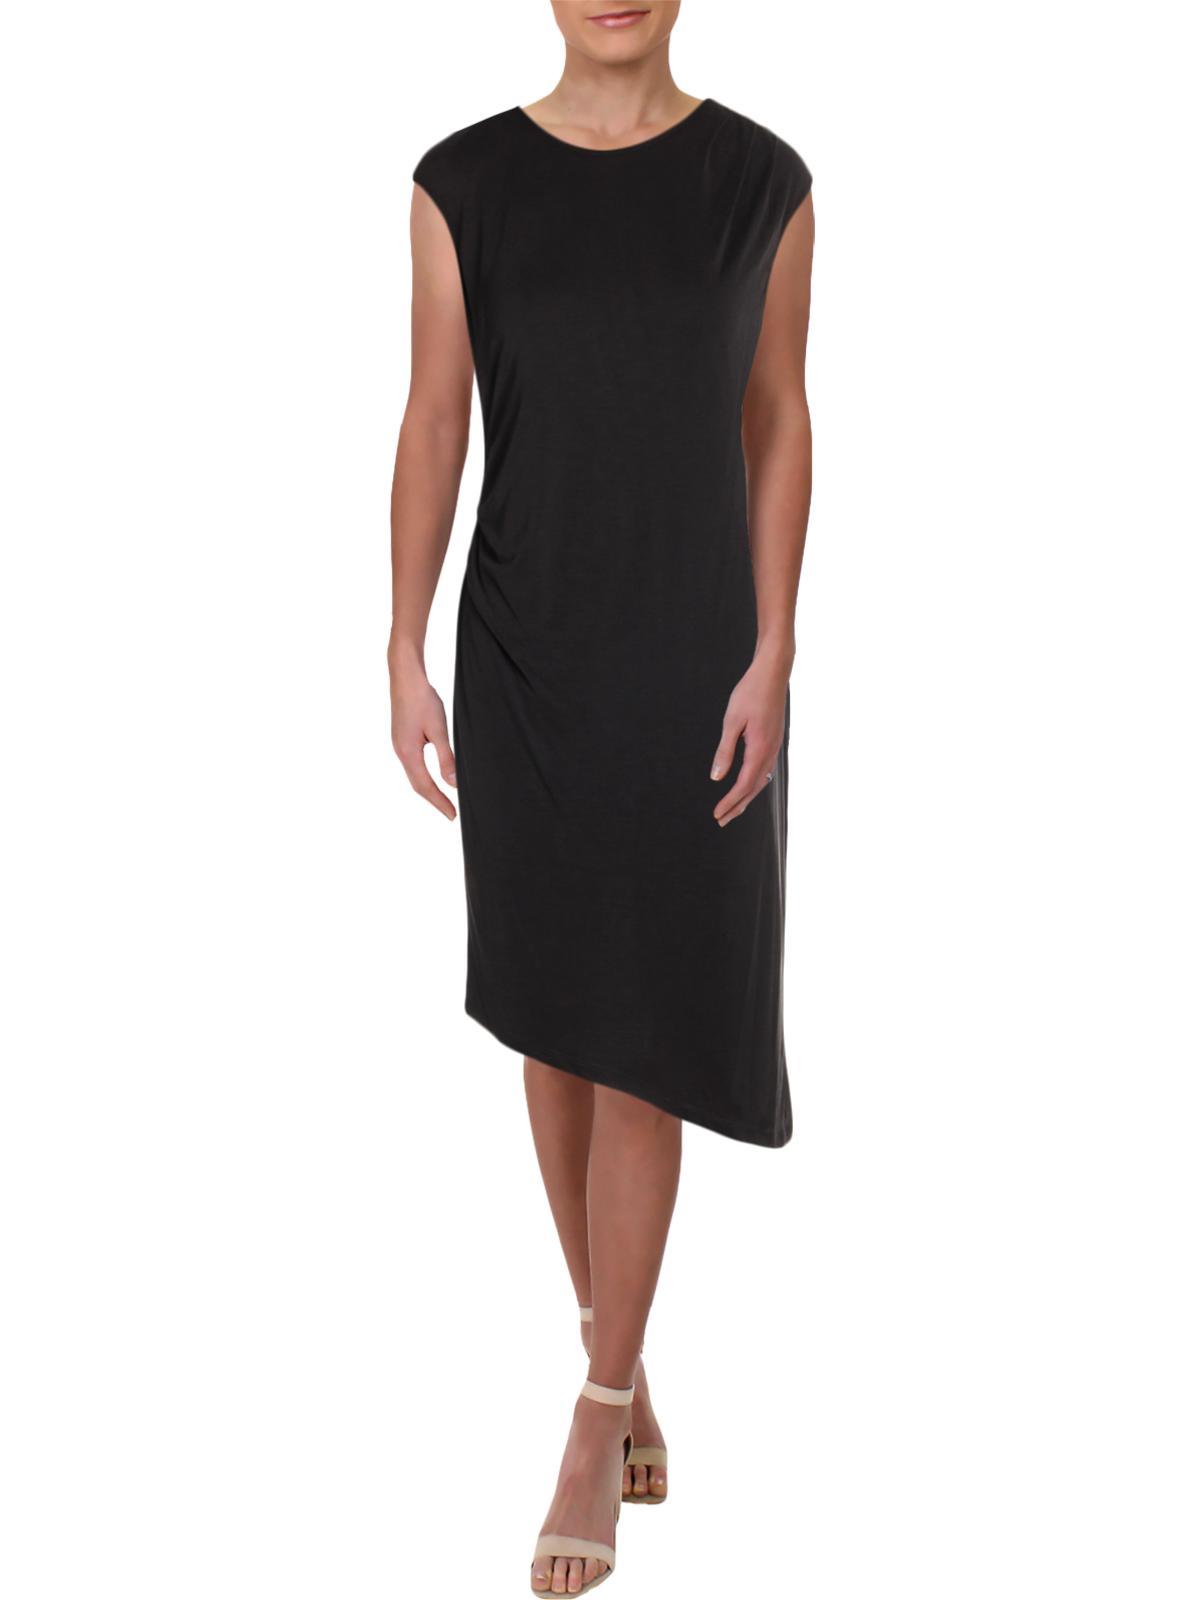 Zoe Cloud Nine Women/'s Asymmetric Ruched Cap Sleeve Midi Dress Nic